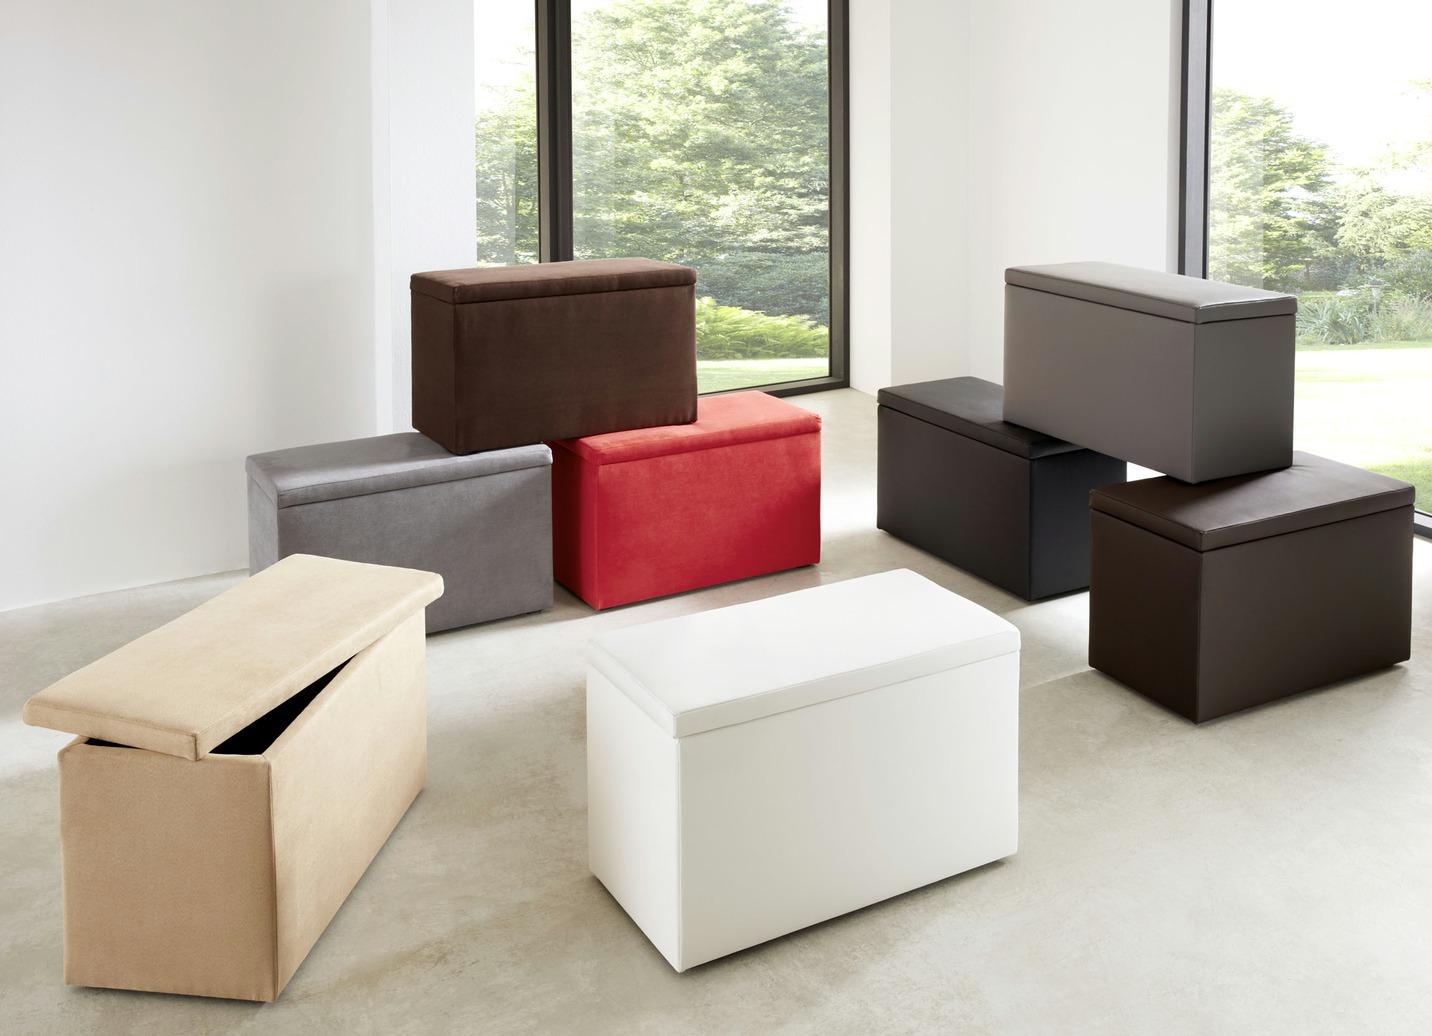 polster sitzbank in verschiedenen ausf hrungen polsterm bel bader. Black Bedroom Furniture Sets. Home Design Ideas